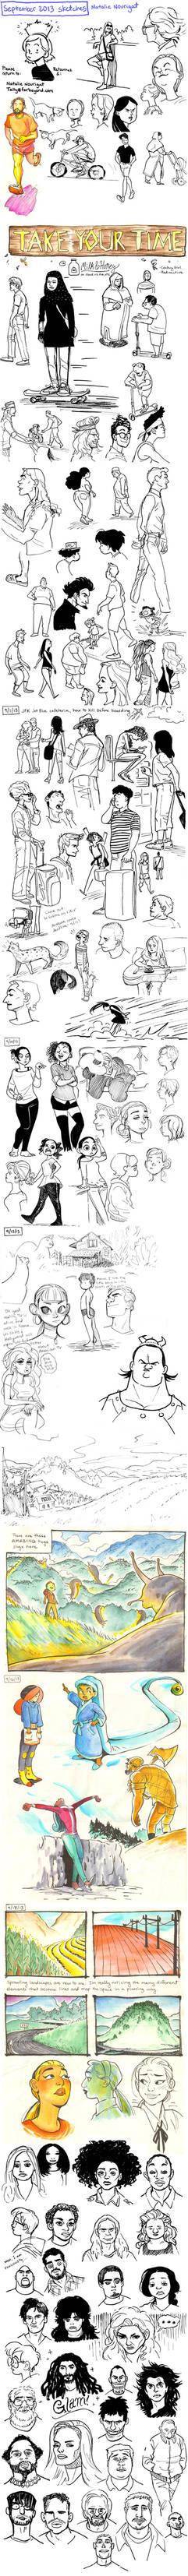 September 2013 sketches